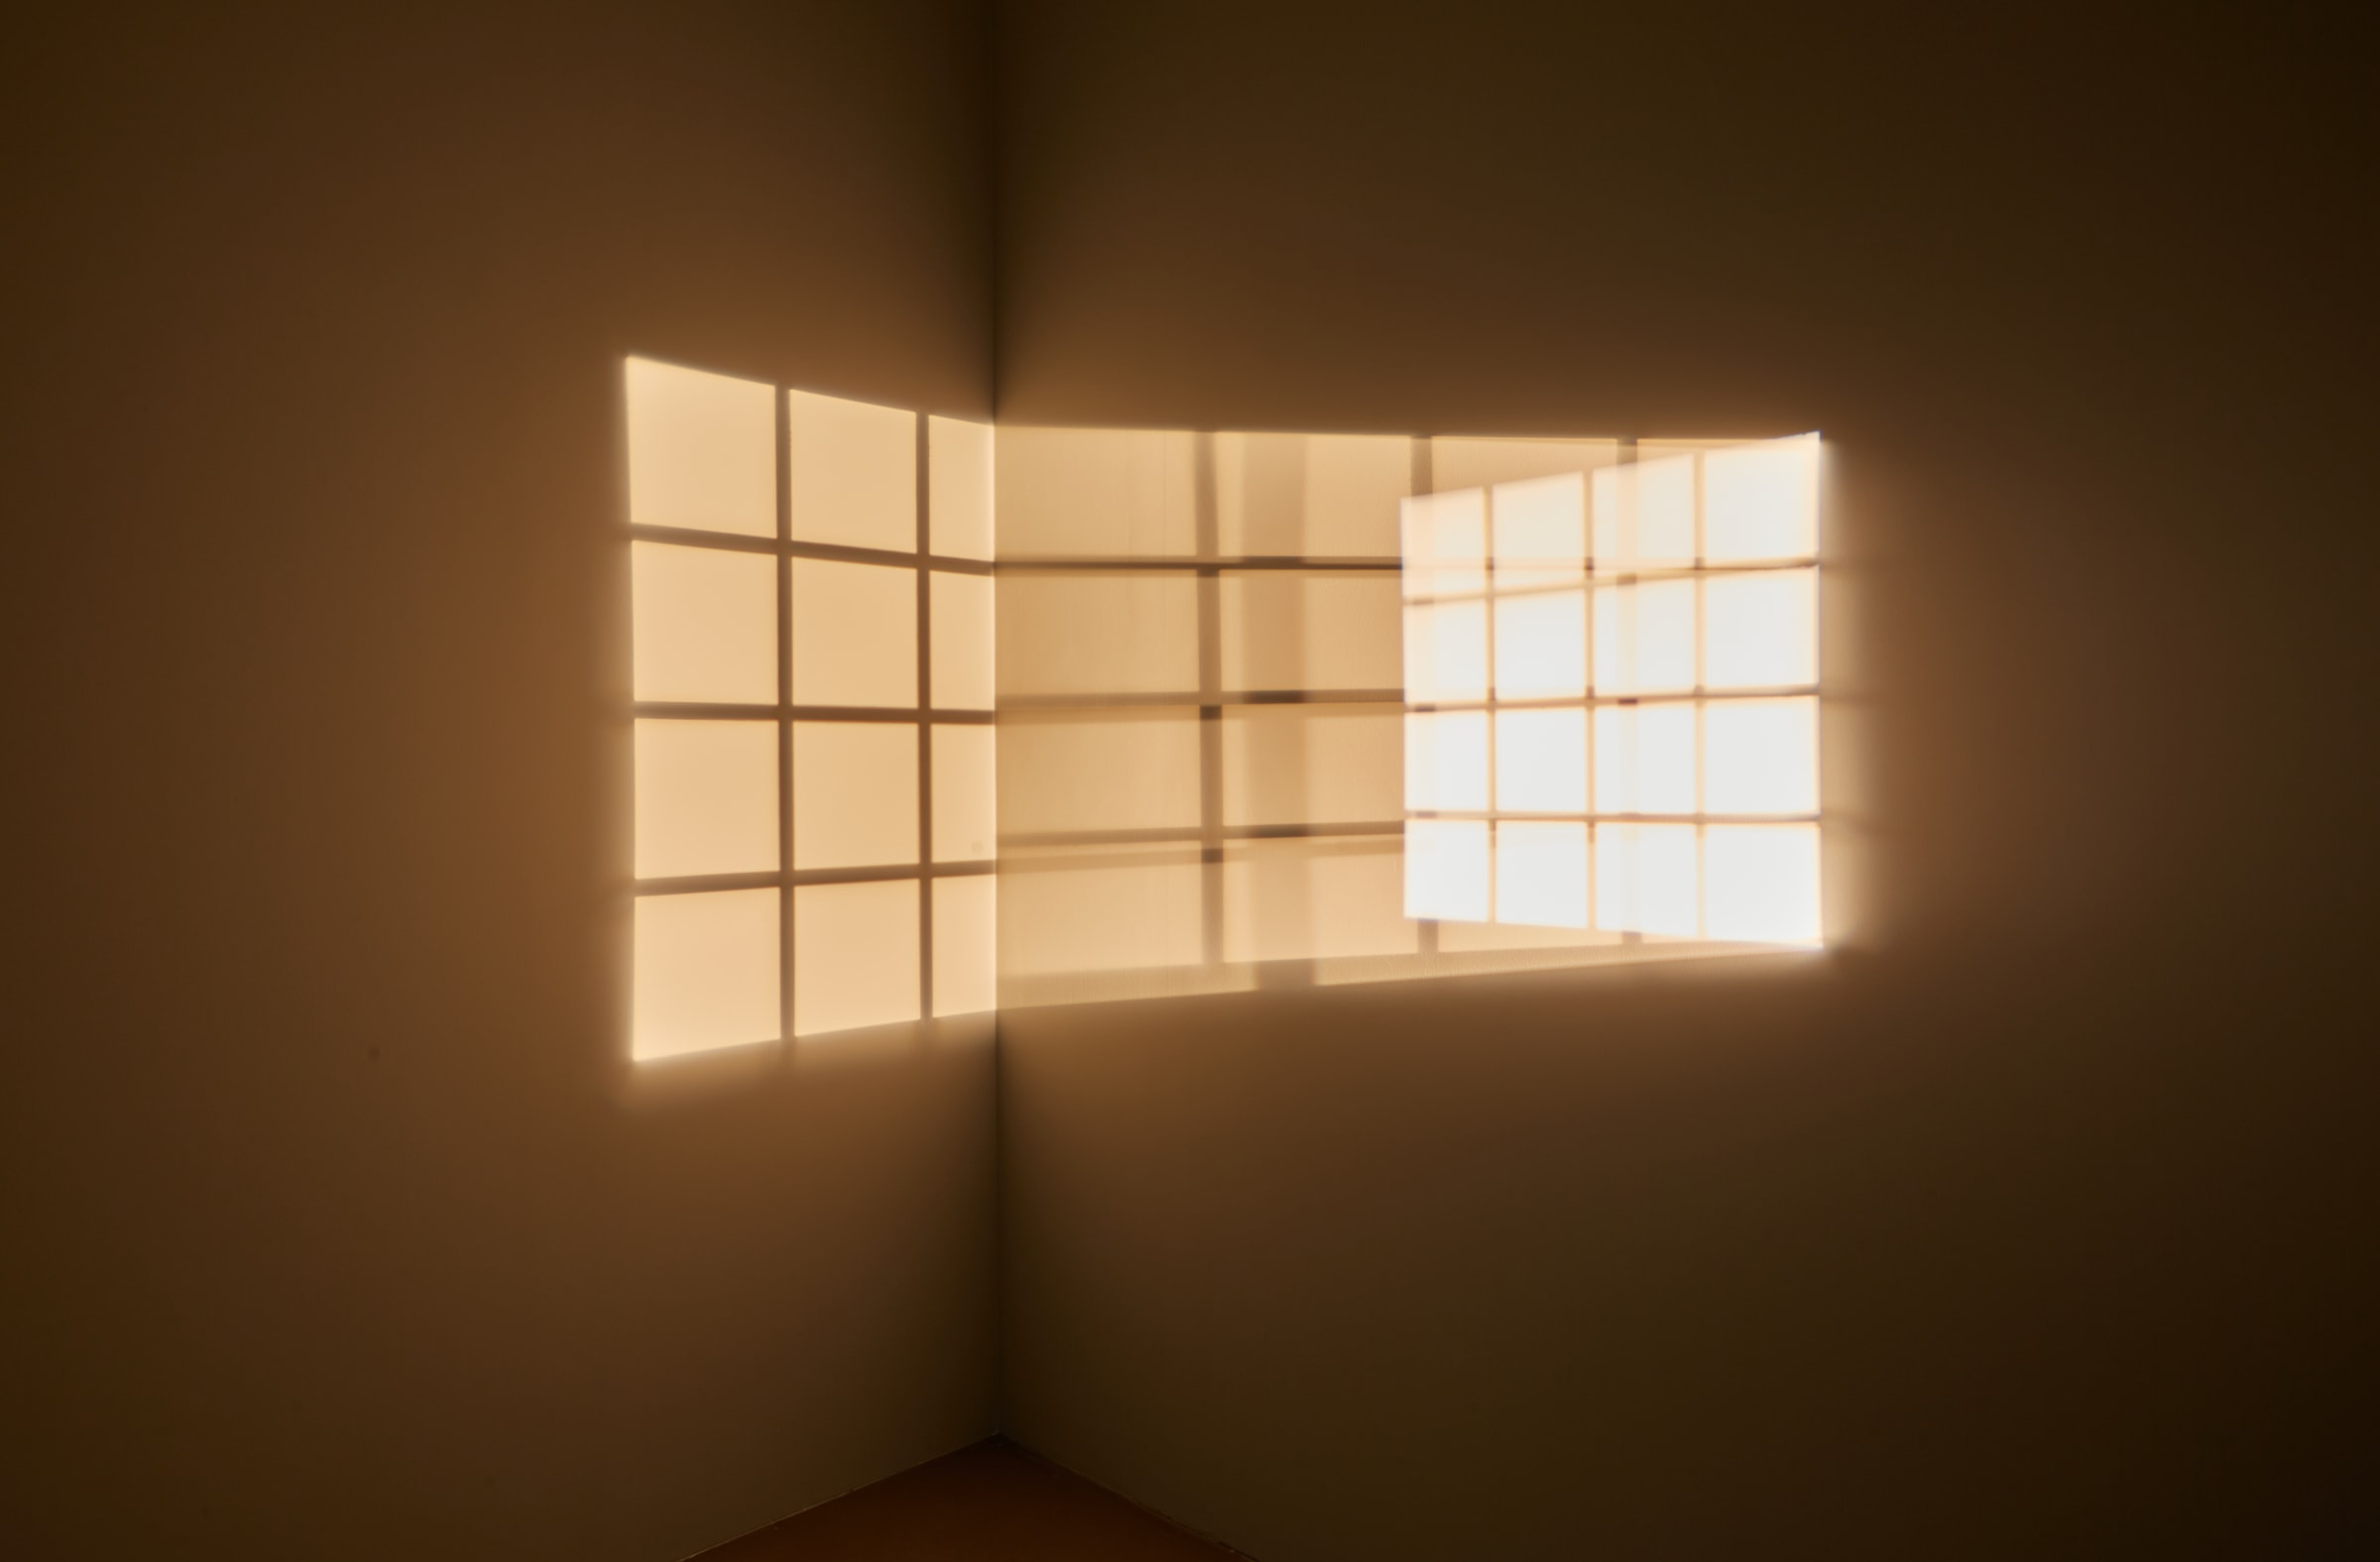 "<span class=""link fancybox-details-link""><a href=""/artists/132-olafur-eliasson/works/14670/"">View Detail Page</a></span><div class=""artist""><strong>ÓLAFUR ELÍASSON</strong></div> <div class=""title""><em>Triple window</em>, 1999</div> <div class=""medium"">3 spotlights, 3 tripods, gobos, </div> <div class=""dimensions"">dimensions variable</div>"